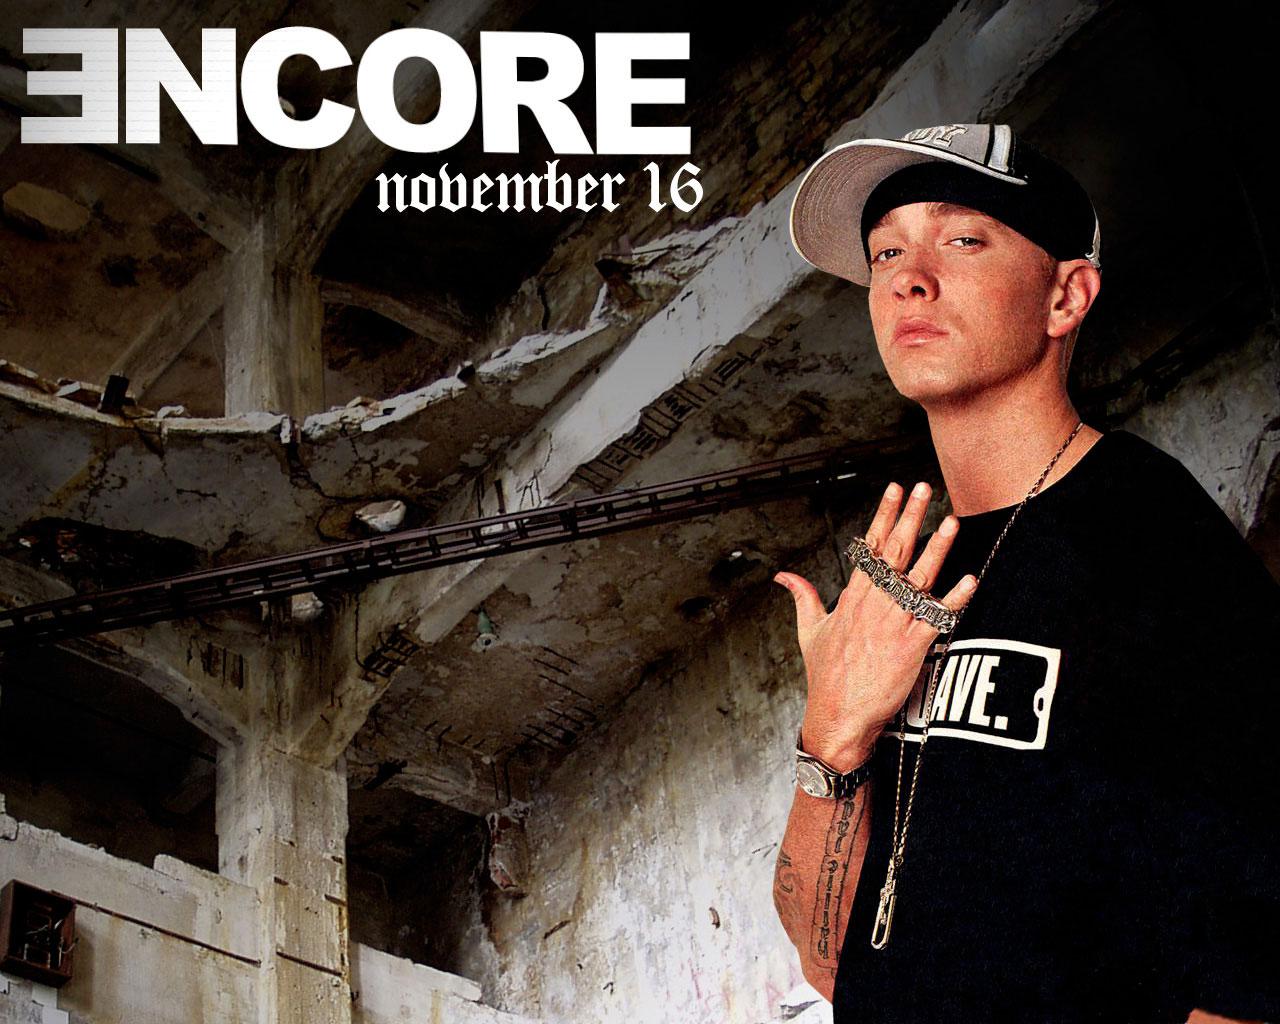 http://2.bp.blogspot.com/-OOOMZqg2D9w/TwCii3YAfoI/AAAAAAAANqY/yotxs2I-Jss/s1600/Eminem+wallpapers+big.jpg